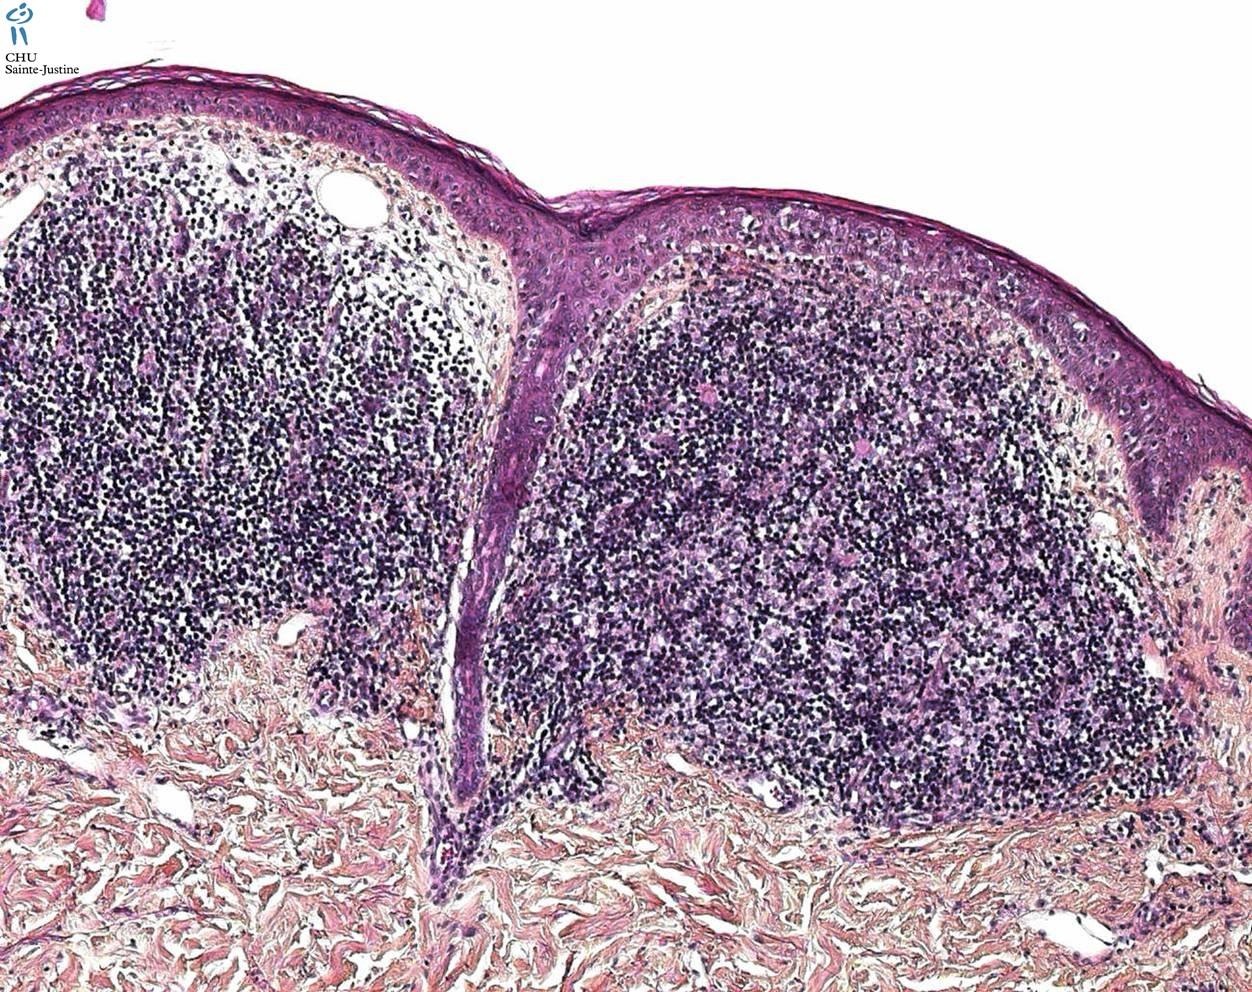 Granuloma Inguinale Humpath Com Human Pathology